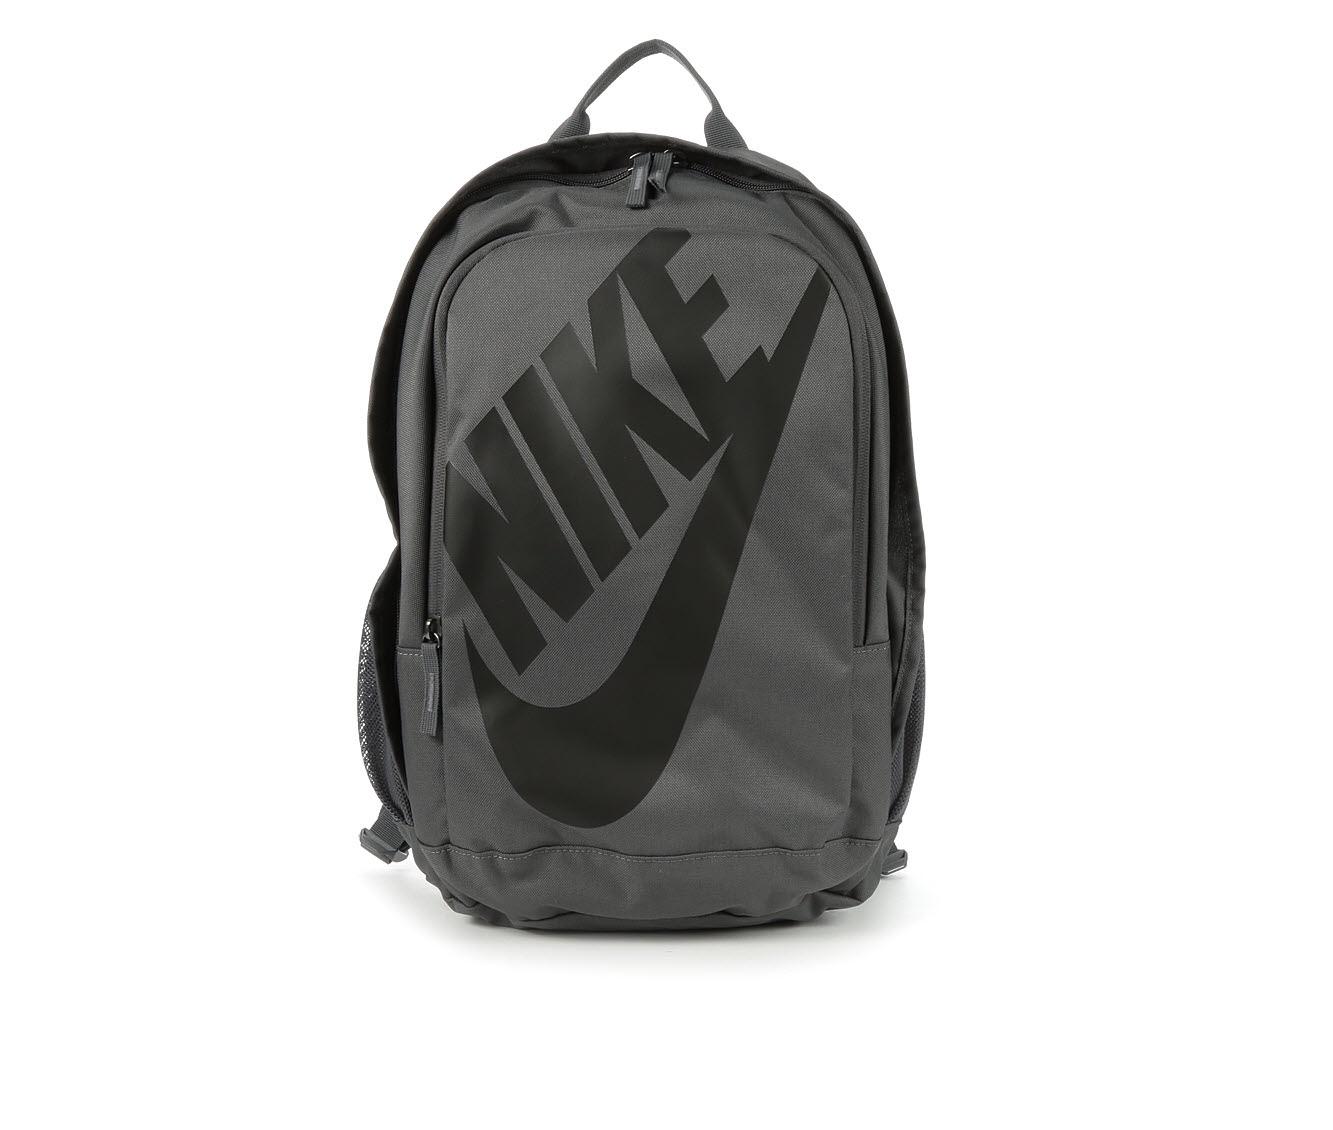 Nike Hayward Futura Backpack (Grey - Size UNSZ) 1567689